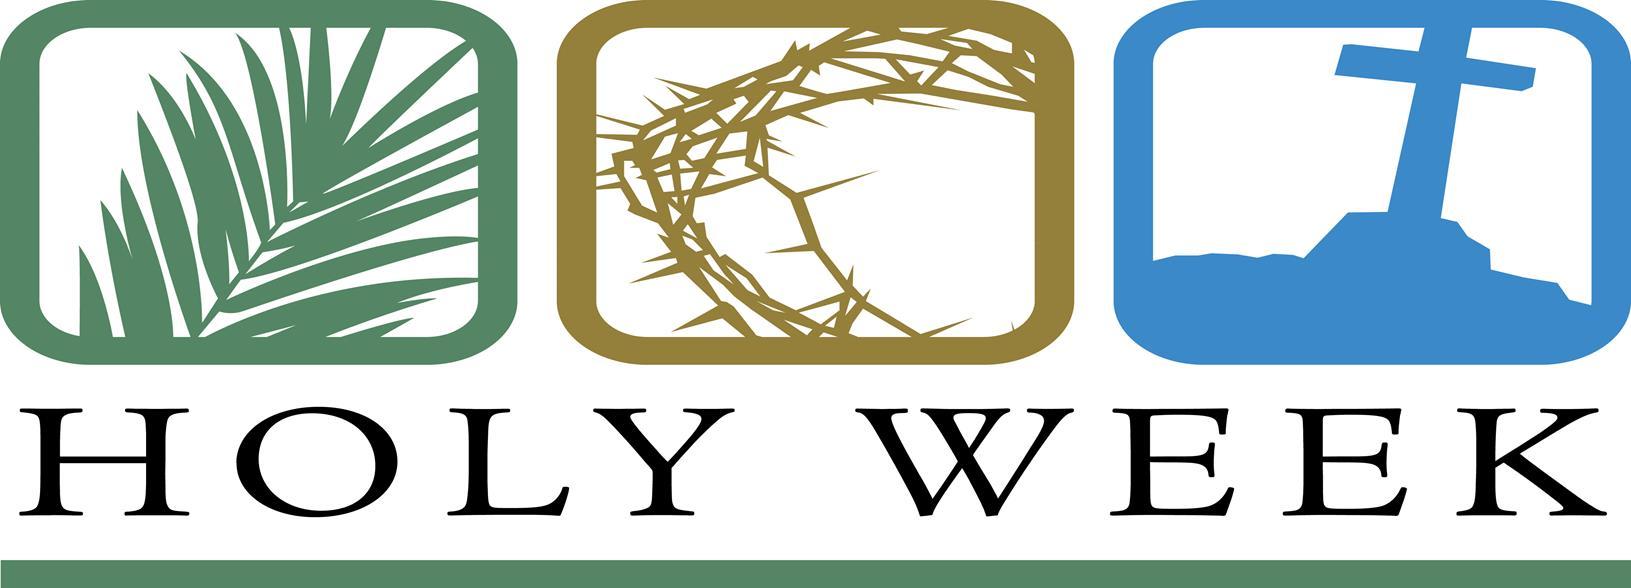 Holy-Week-Symbols-Banner-Image